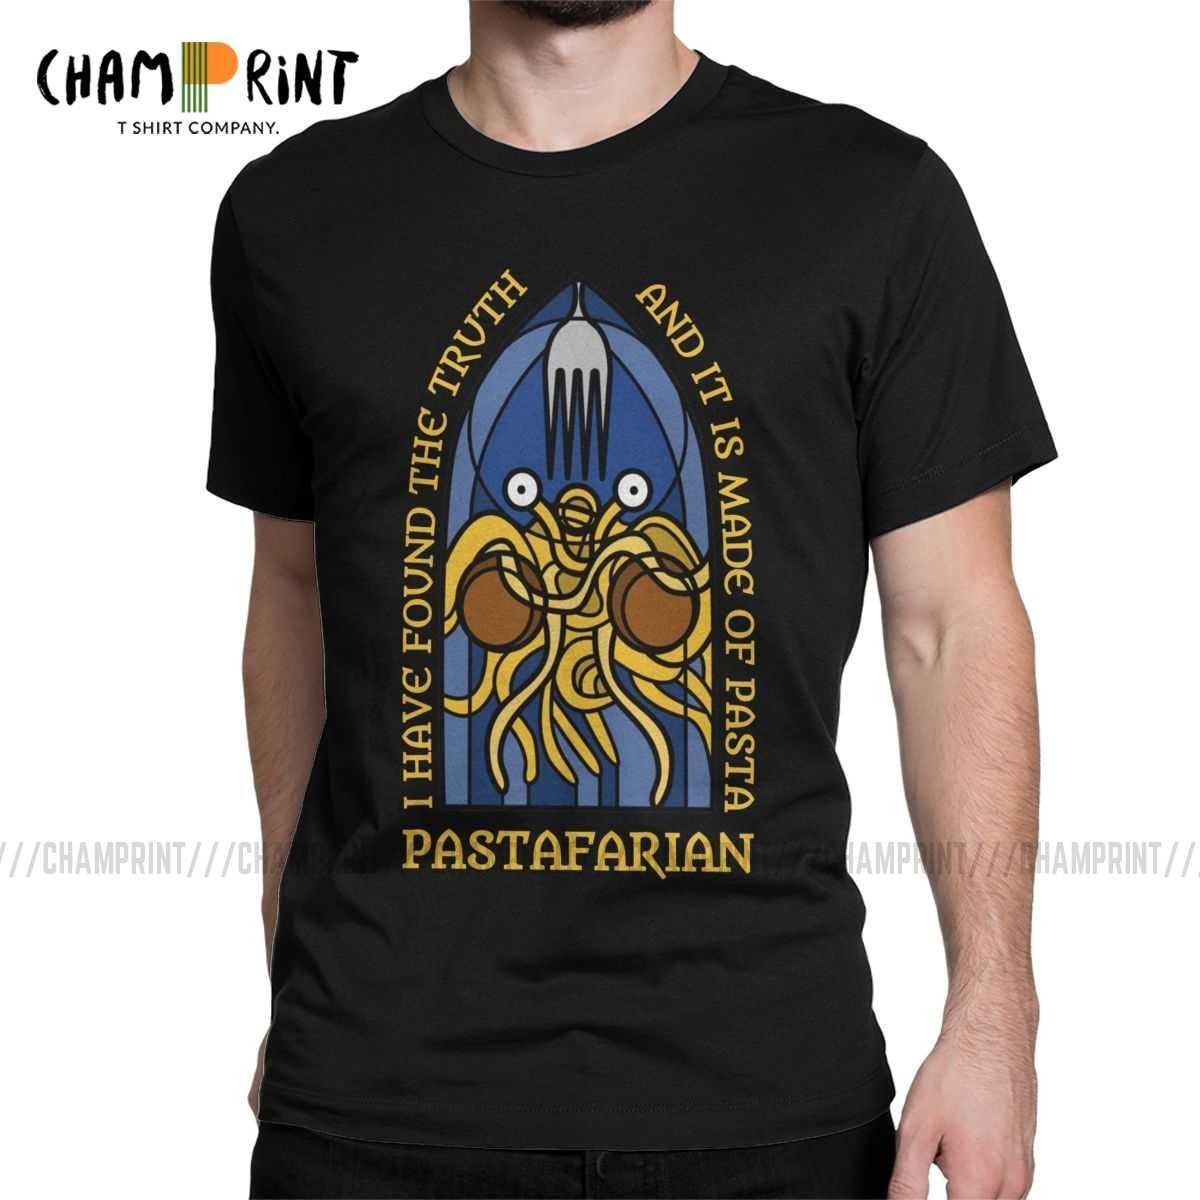 Pria Pastafarian T Shirt Terbang Spaghetti Monsterism Pastafarianism FSM Agama Gereja Pakaian Lucu Tee Kemeja Hadiah T-shirt